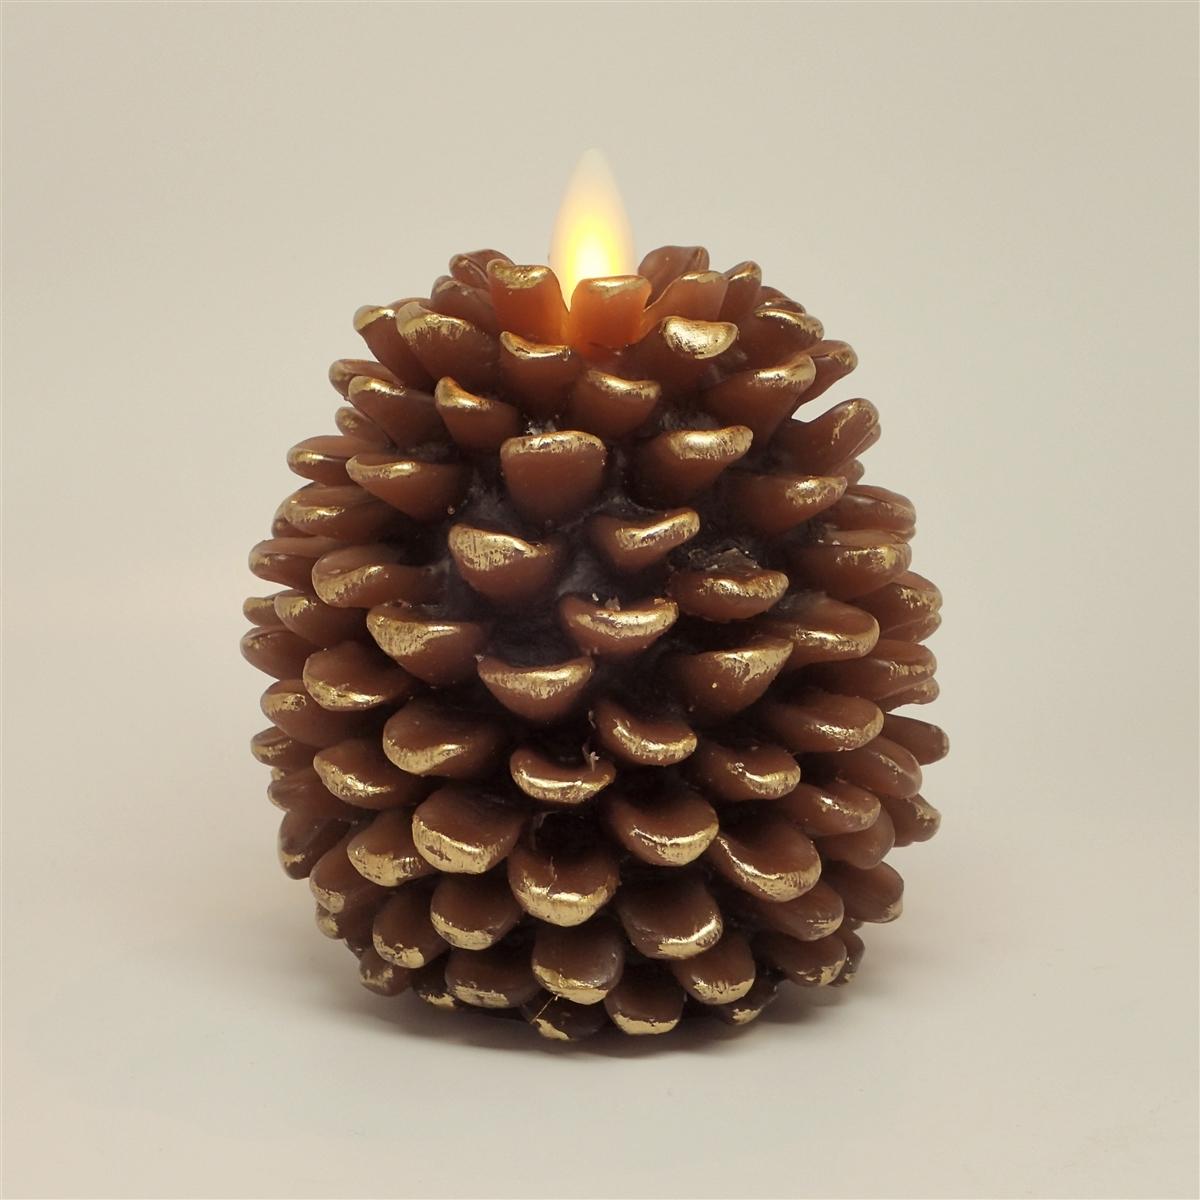 Pine Cone Candles Luminara Flameless Led Candles Pine Cone Shape 325 Inch X 4